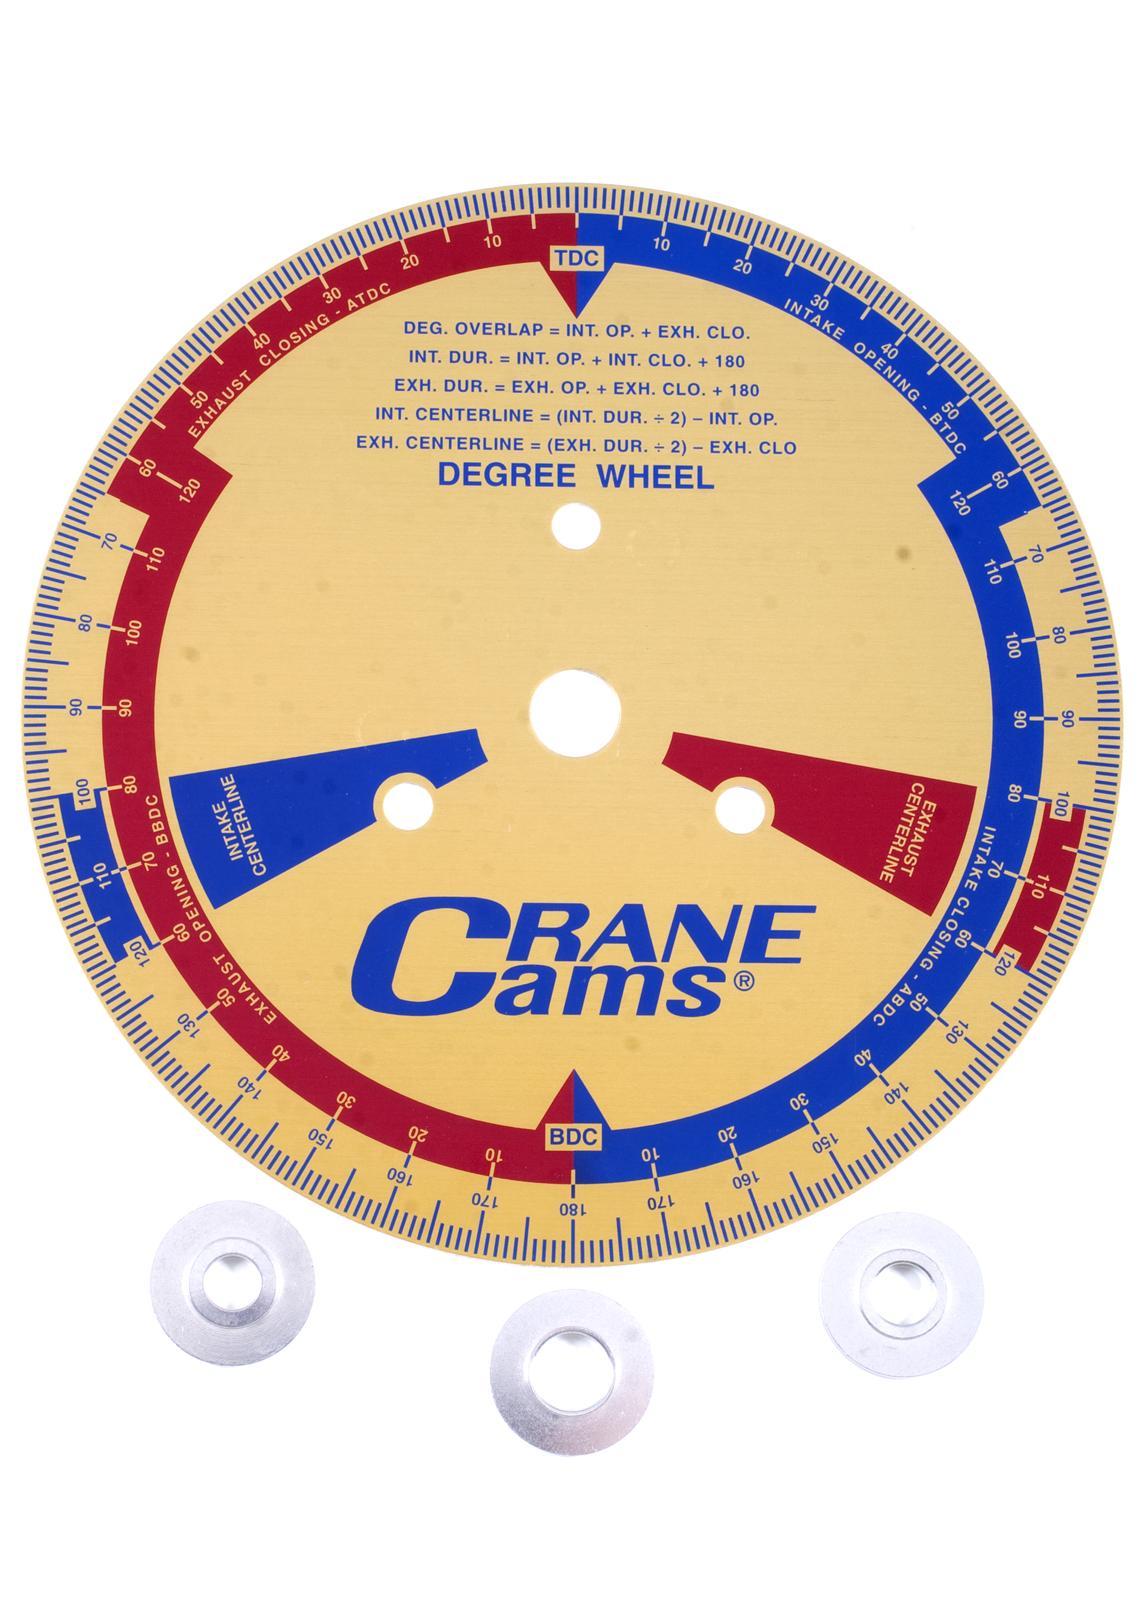 Crane Cam Degree Wheels 99162-1